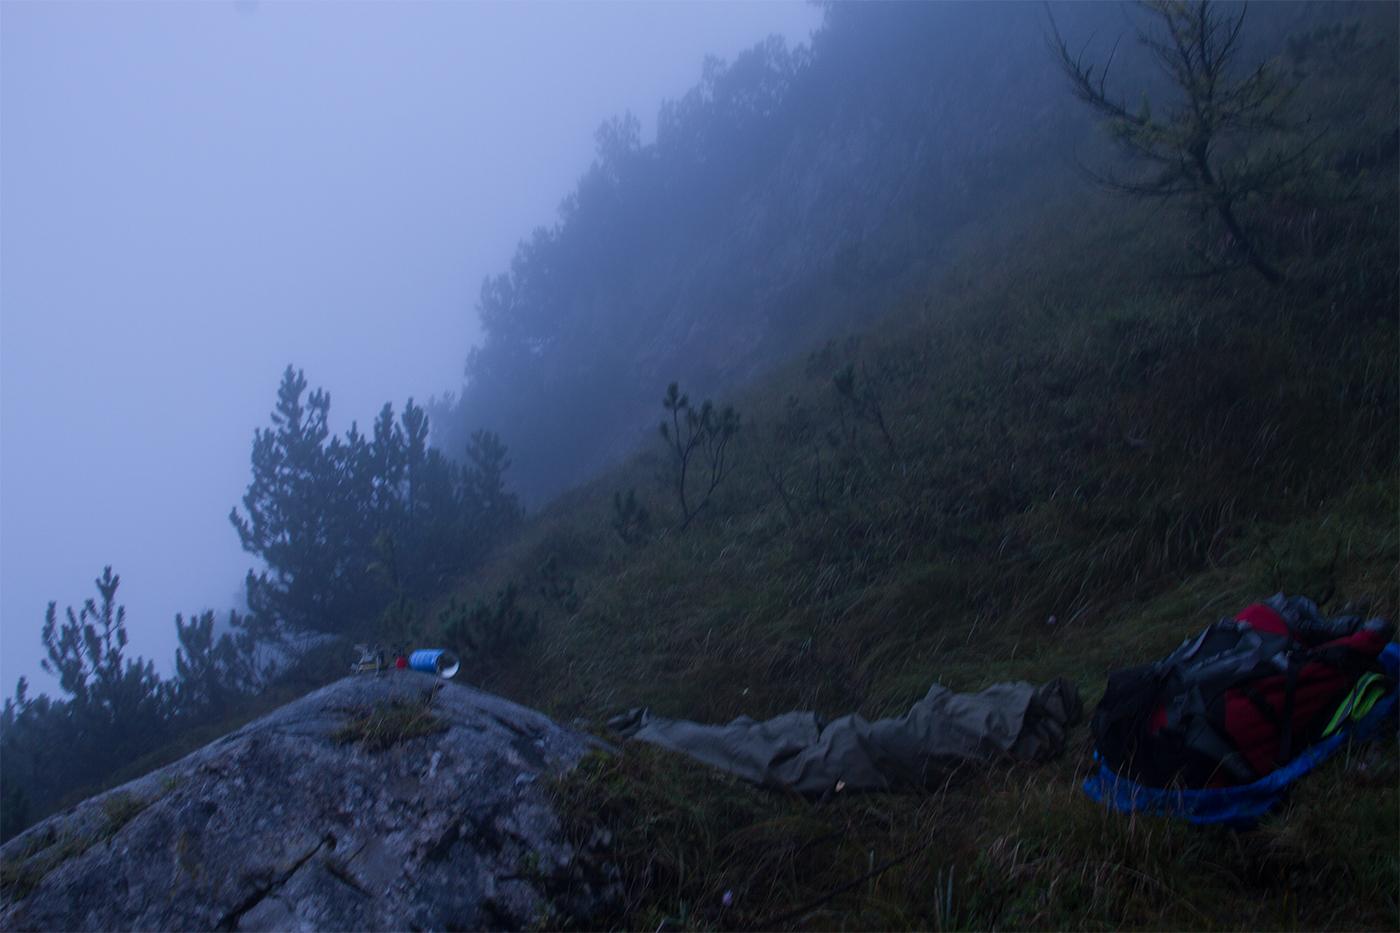 Bergtour Biwak - Teufelslöcher 2700hm über Bertgenhütte